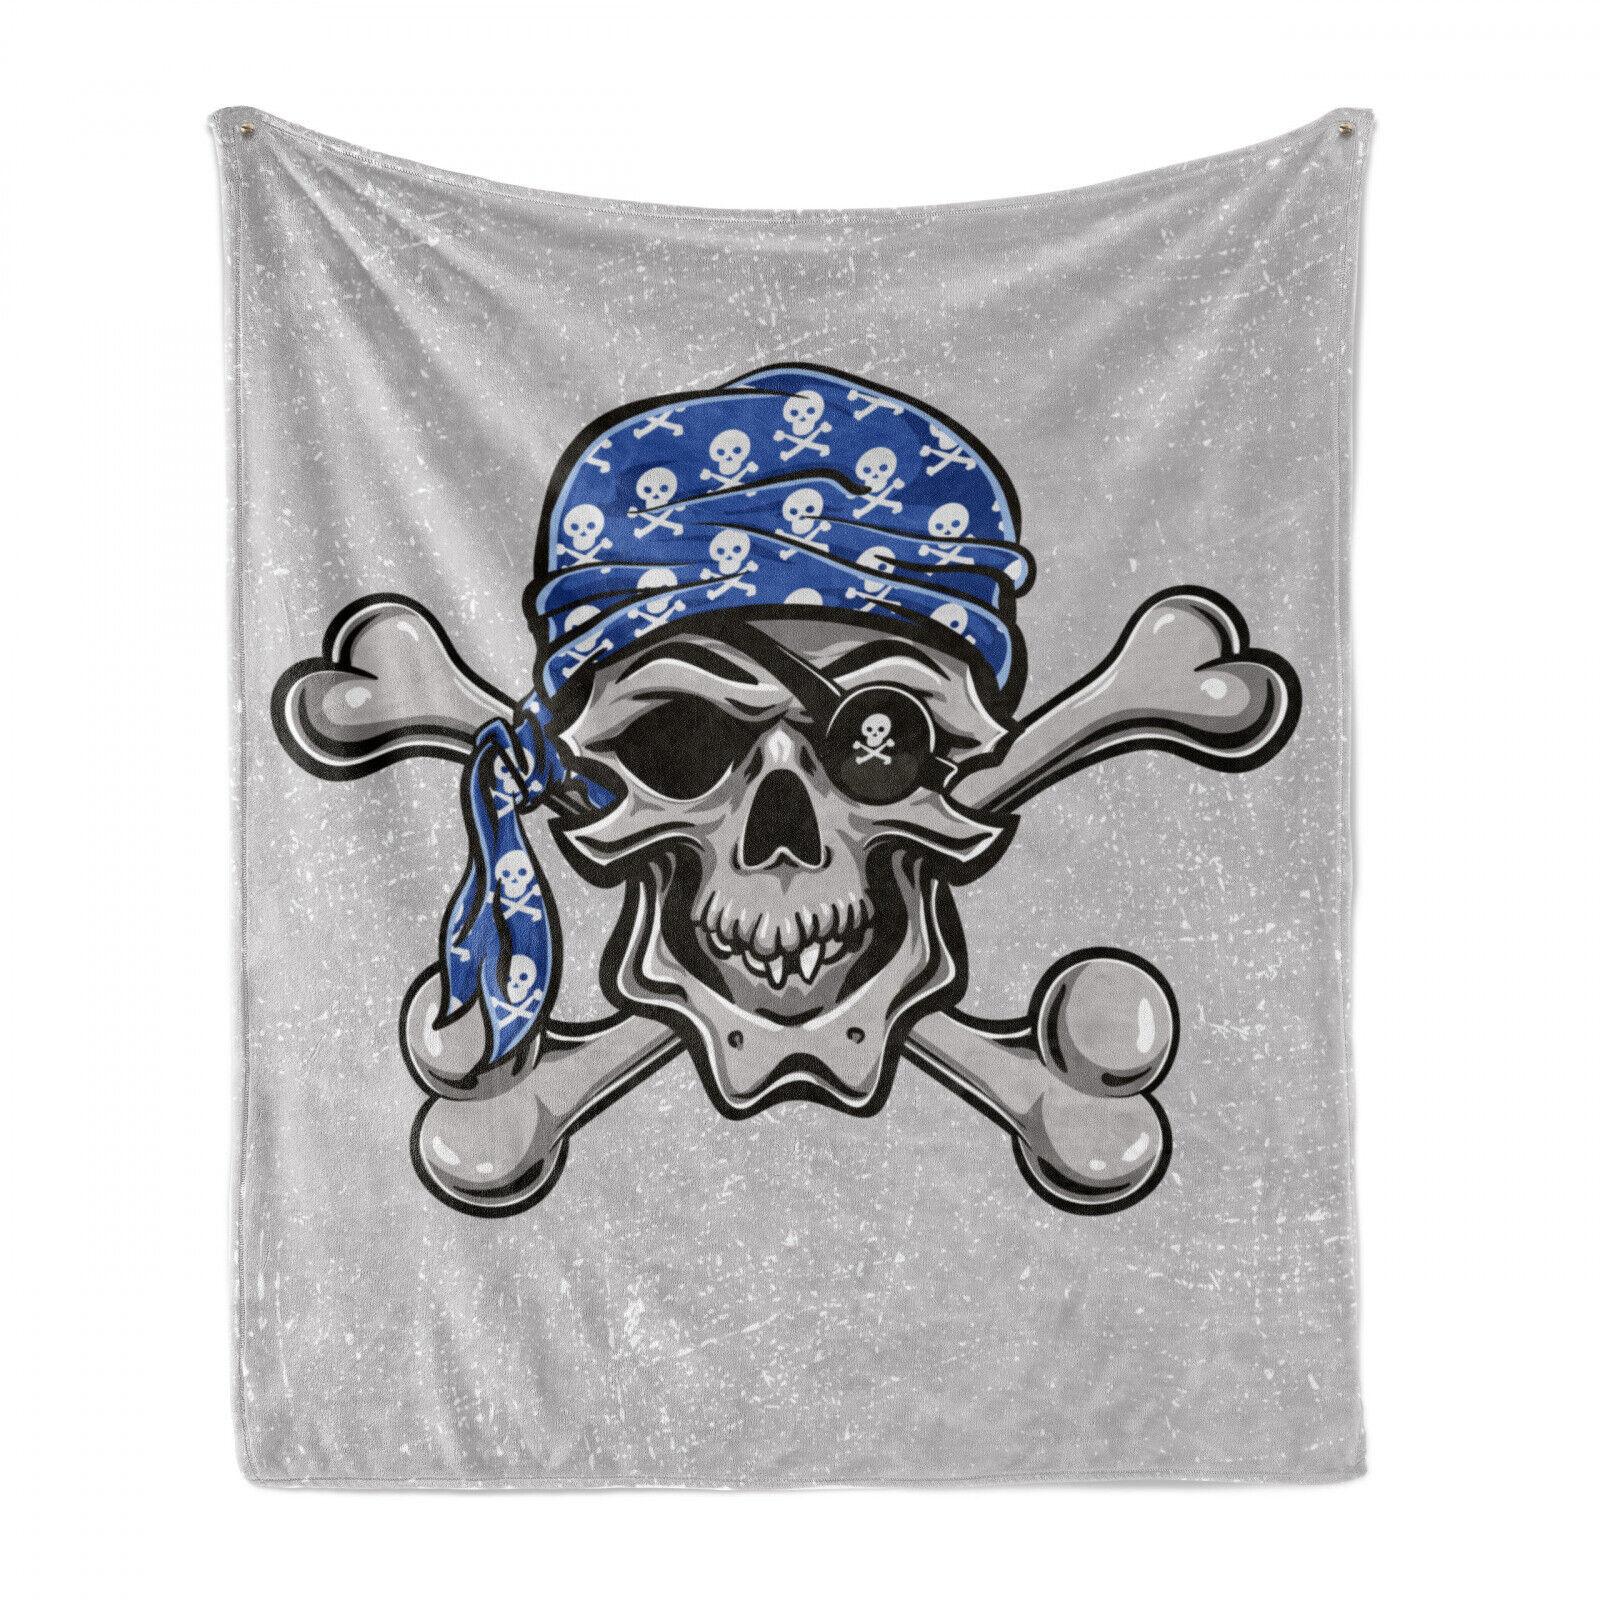 Skull Soft Flannel Fleece Blanket Pirate Bad Head Bone